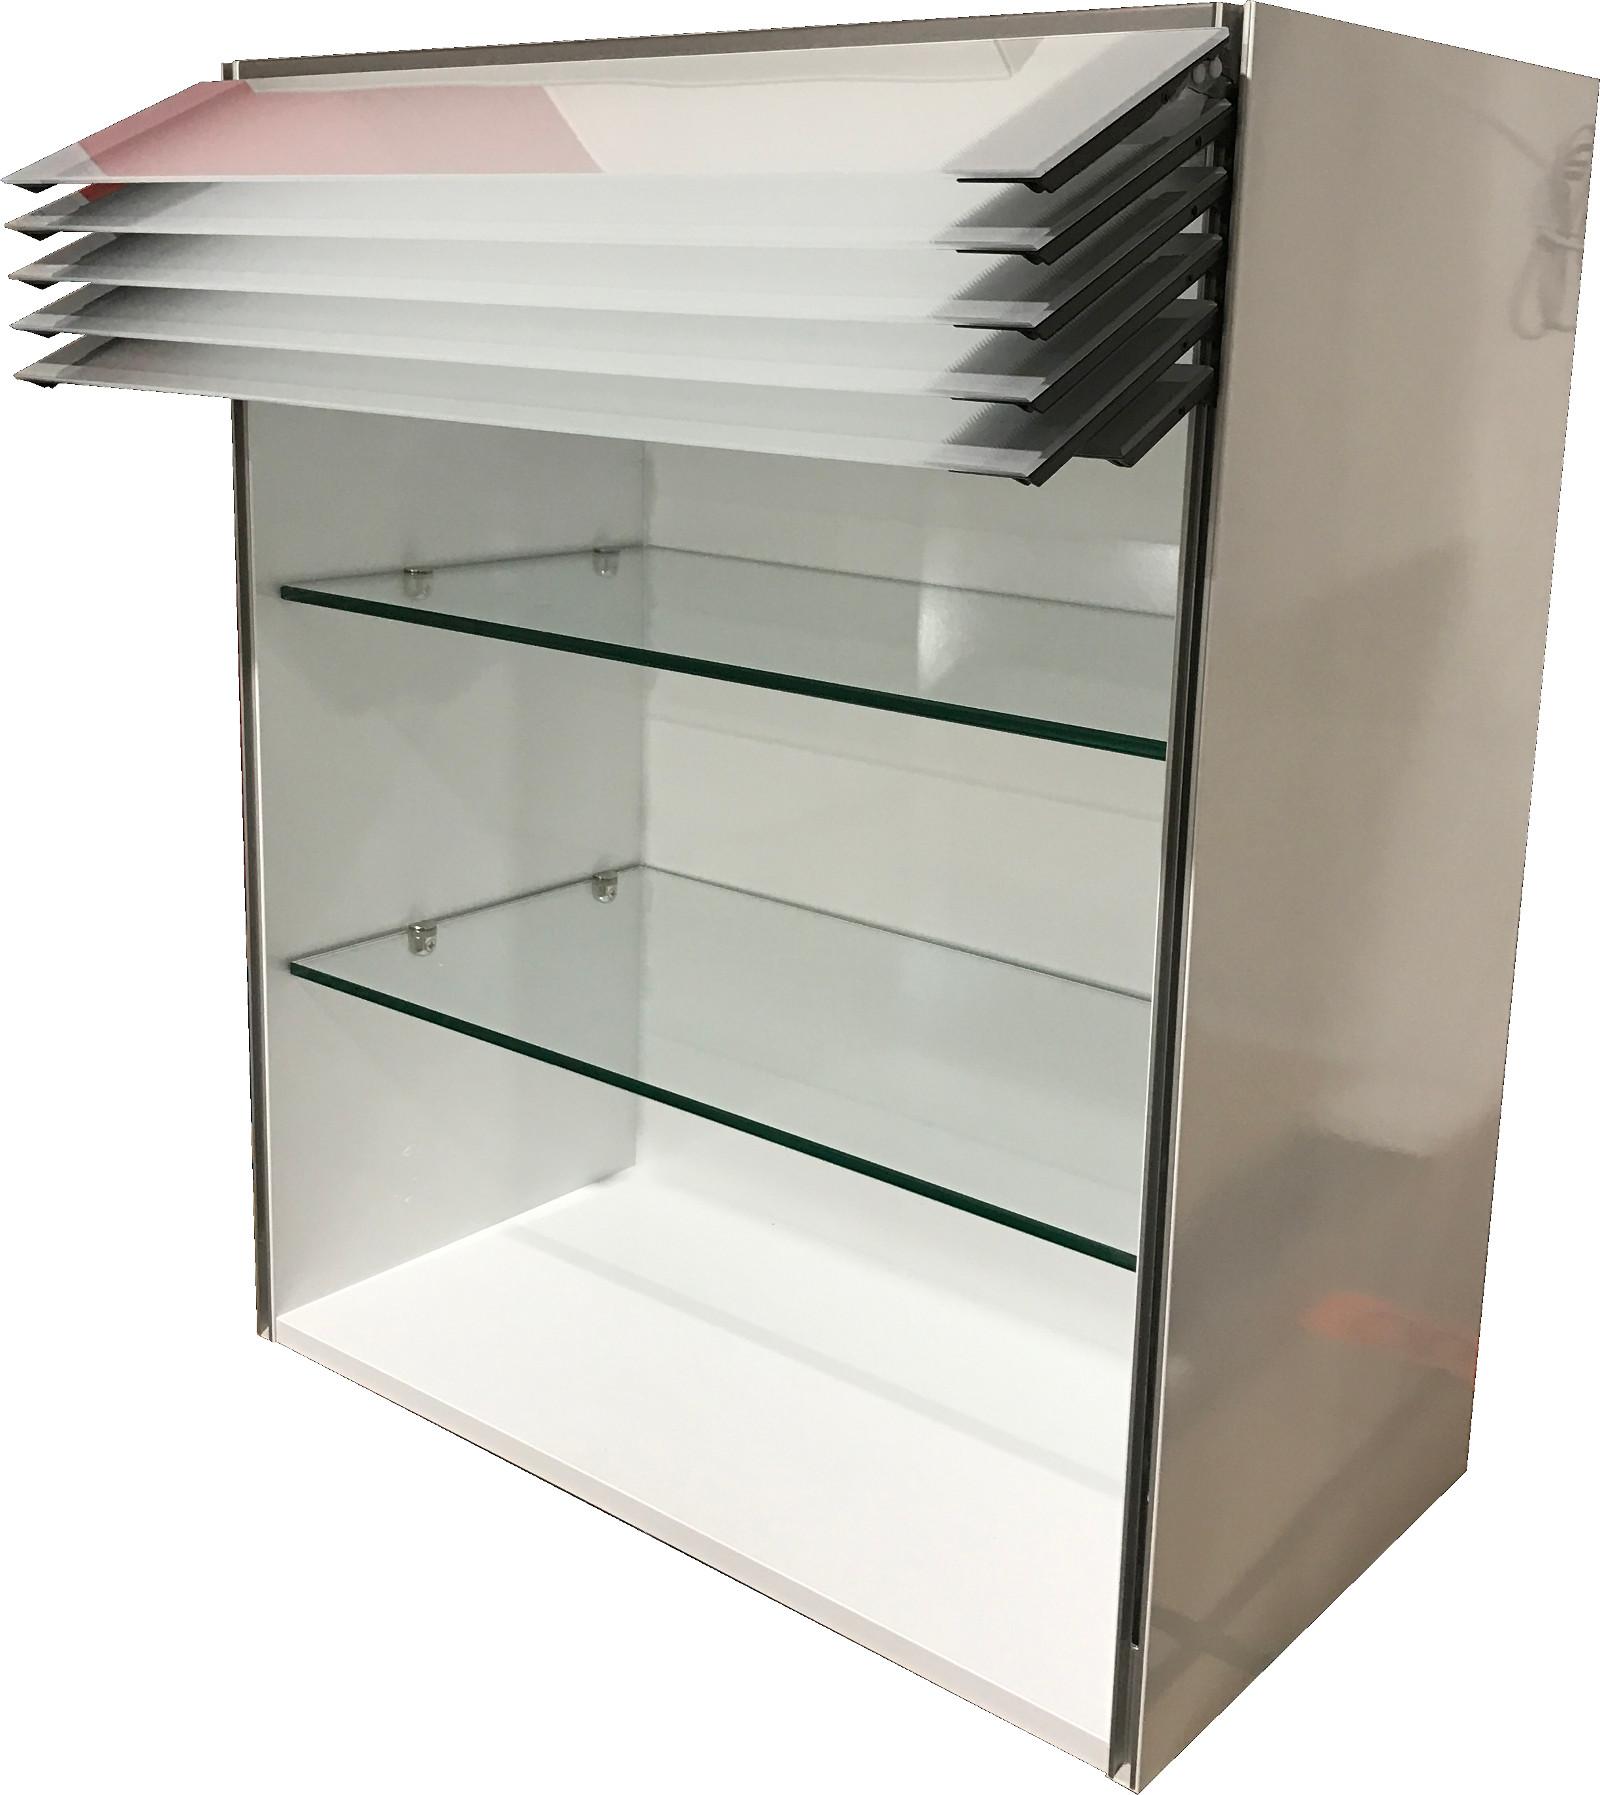 h ngeschrank k chenschrank k che elektronisch wandschrank climber mattglas ebay. Black Bedroom Furniture Sets. Home Design Ideas